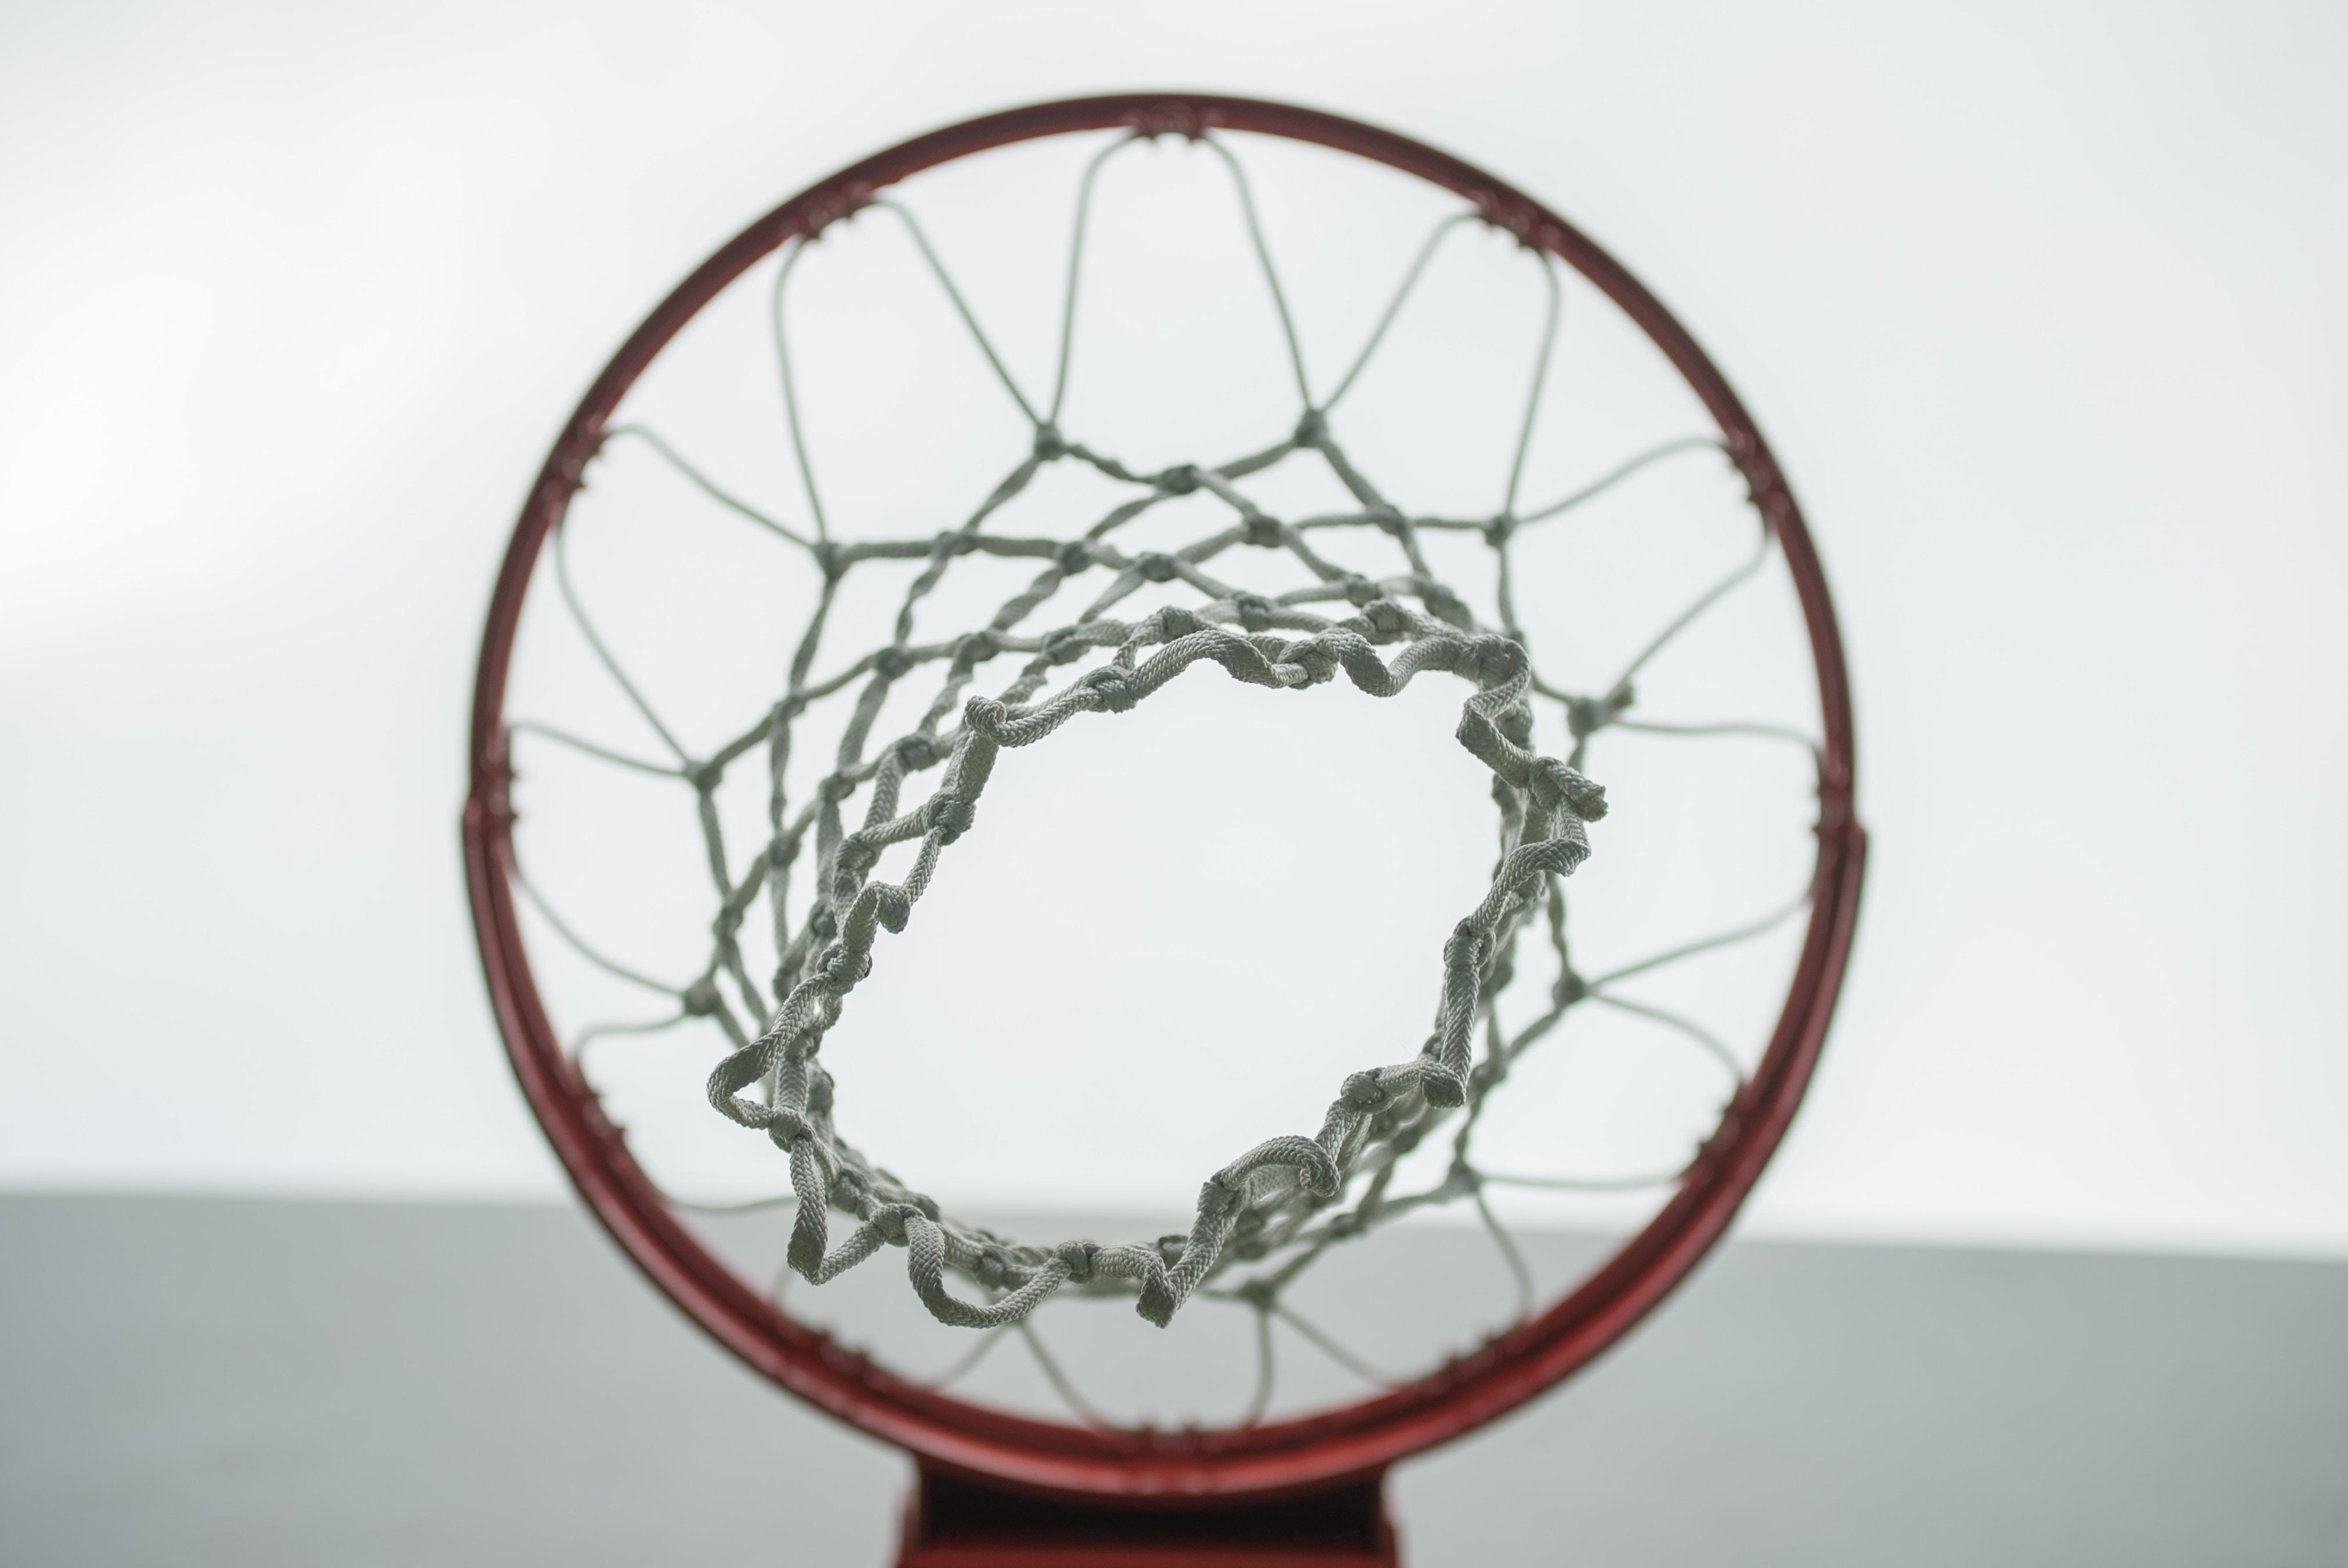 low angle photo of basketball hoop